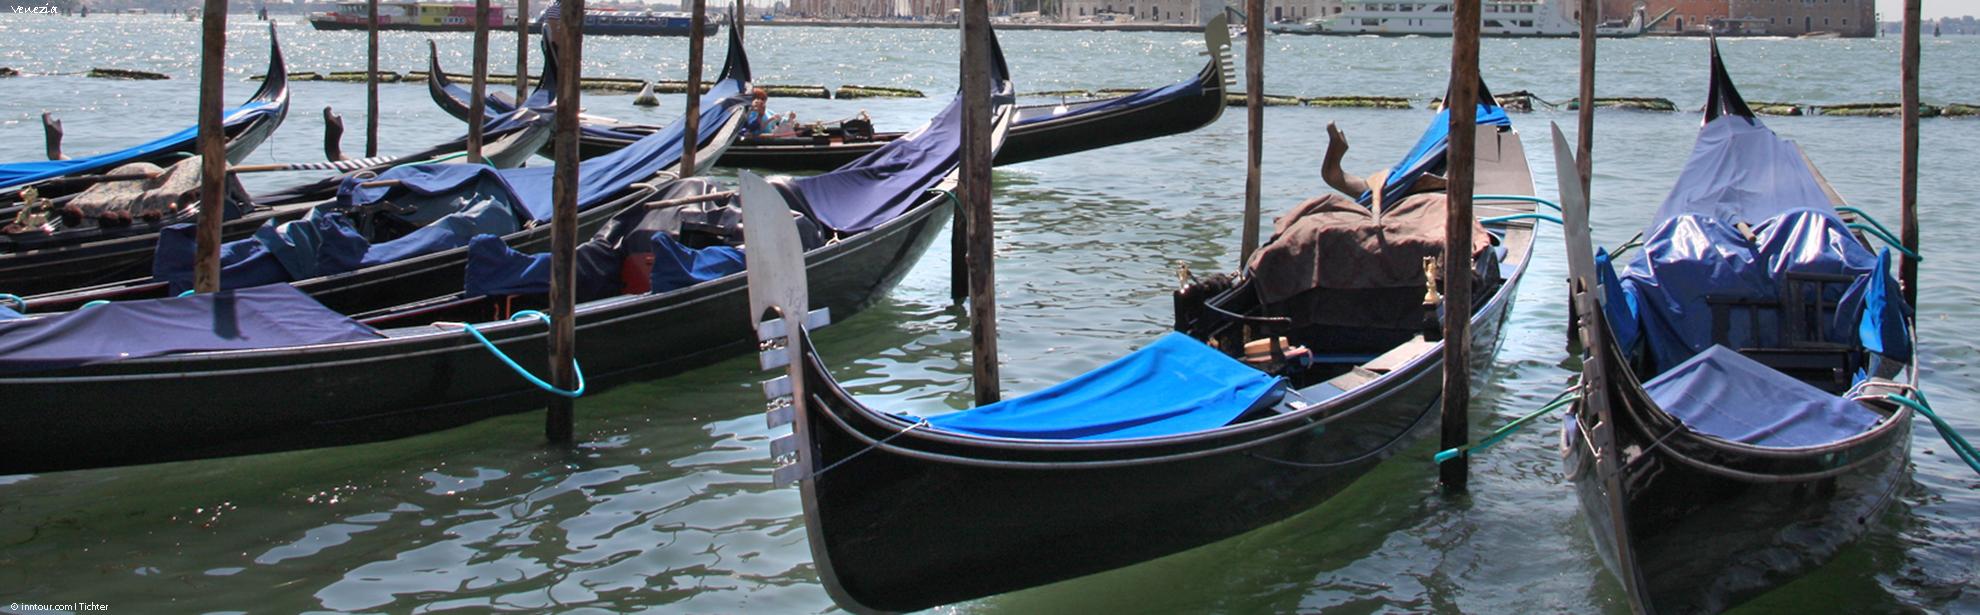 Oklassinntour_Tichter_Venezia_IMG_3405-2